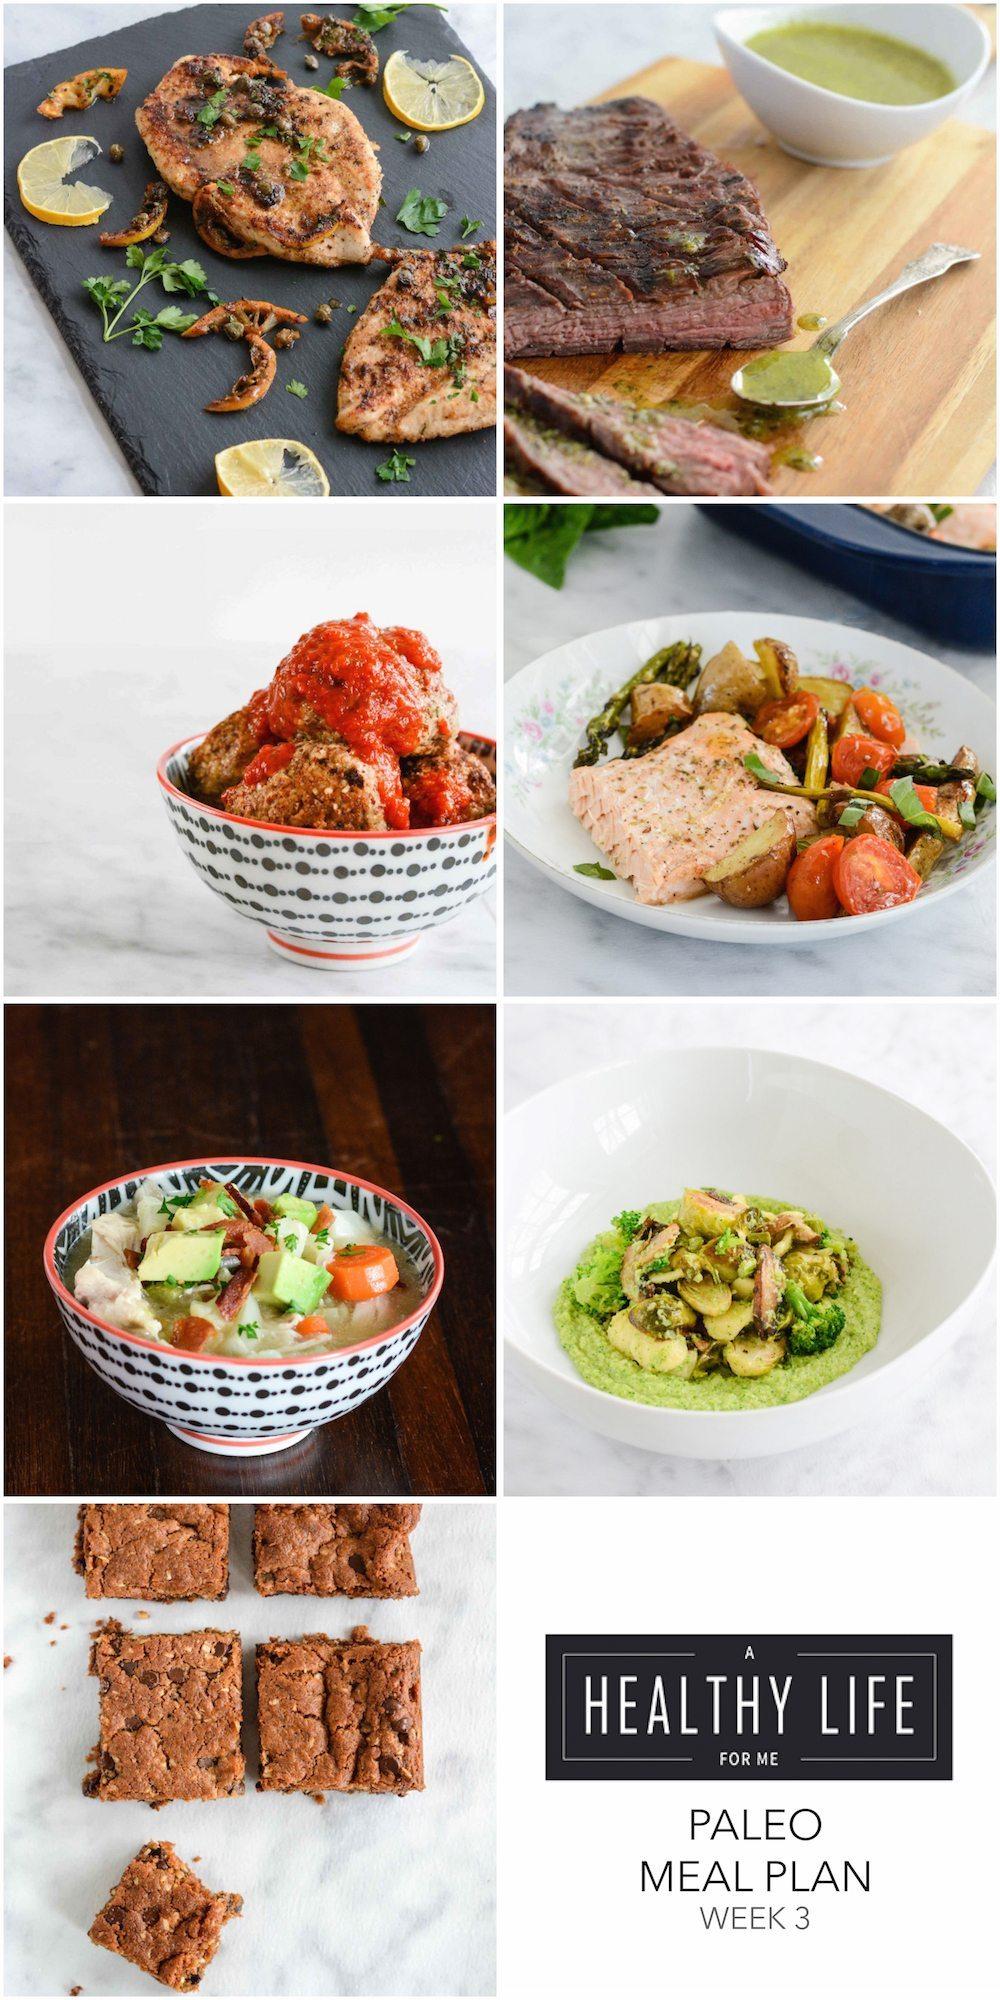 Paleo Meal Plan Week 2 Gluten Free and Paleo Recipes | ahelathylifeforme.com